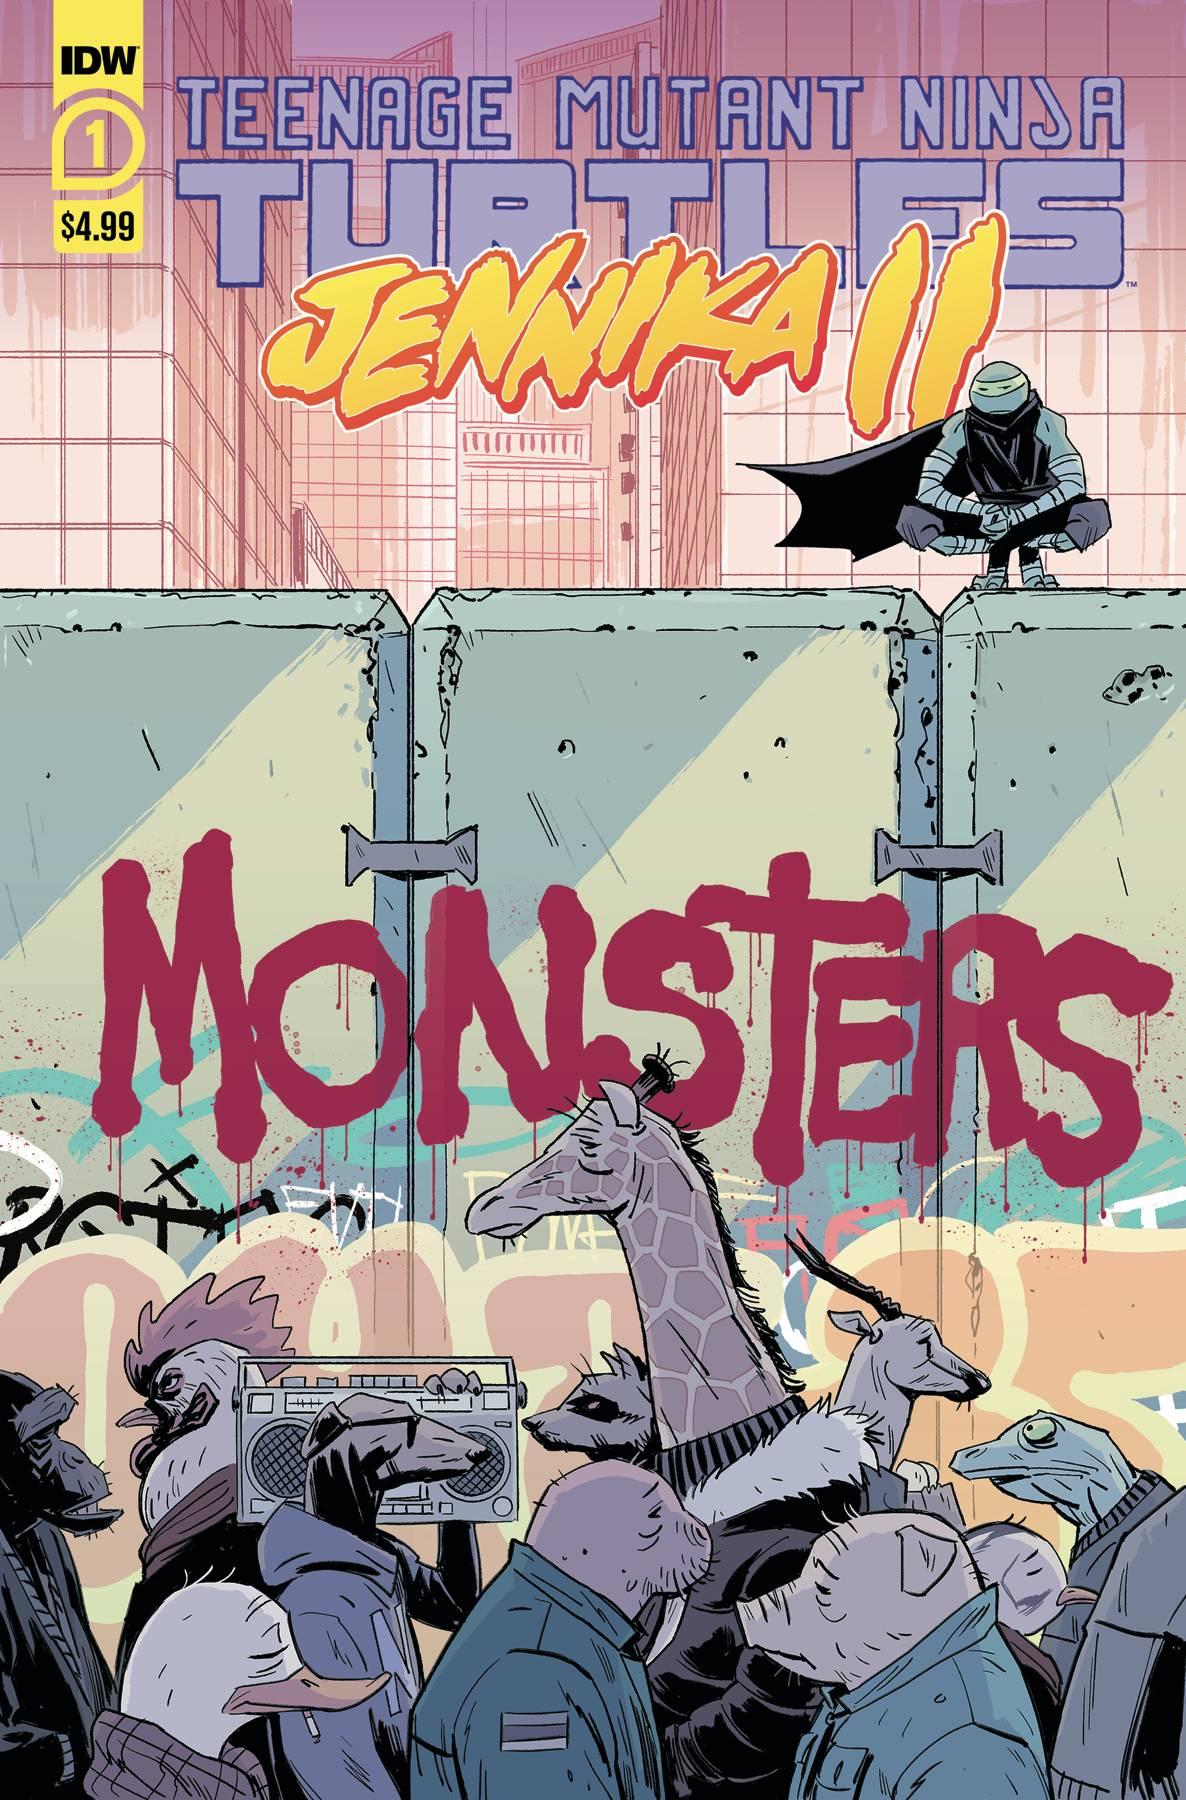 TMNT JENNIKA II #1 (OF 6) CVR A REVEL